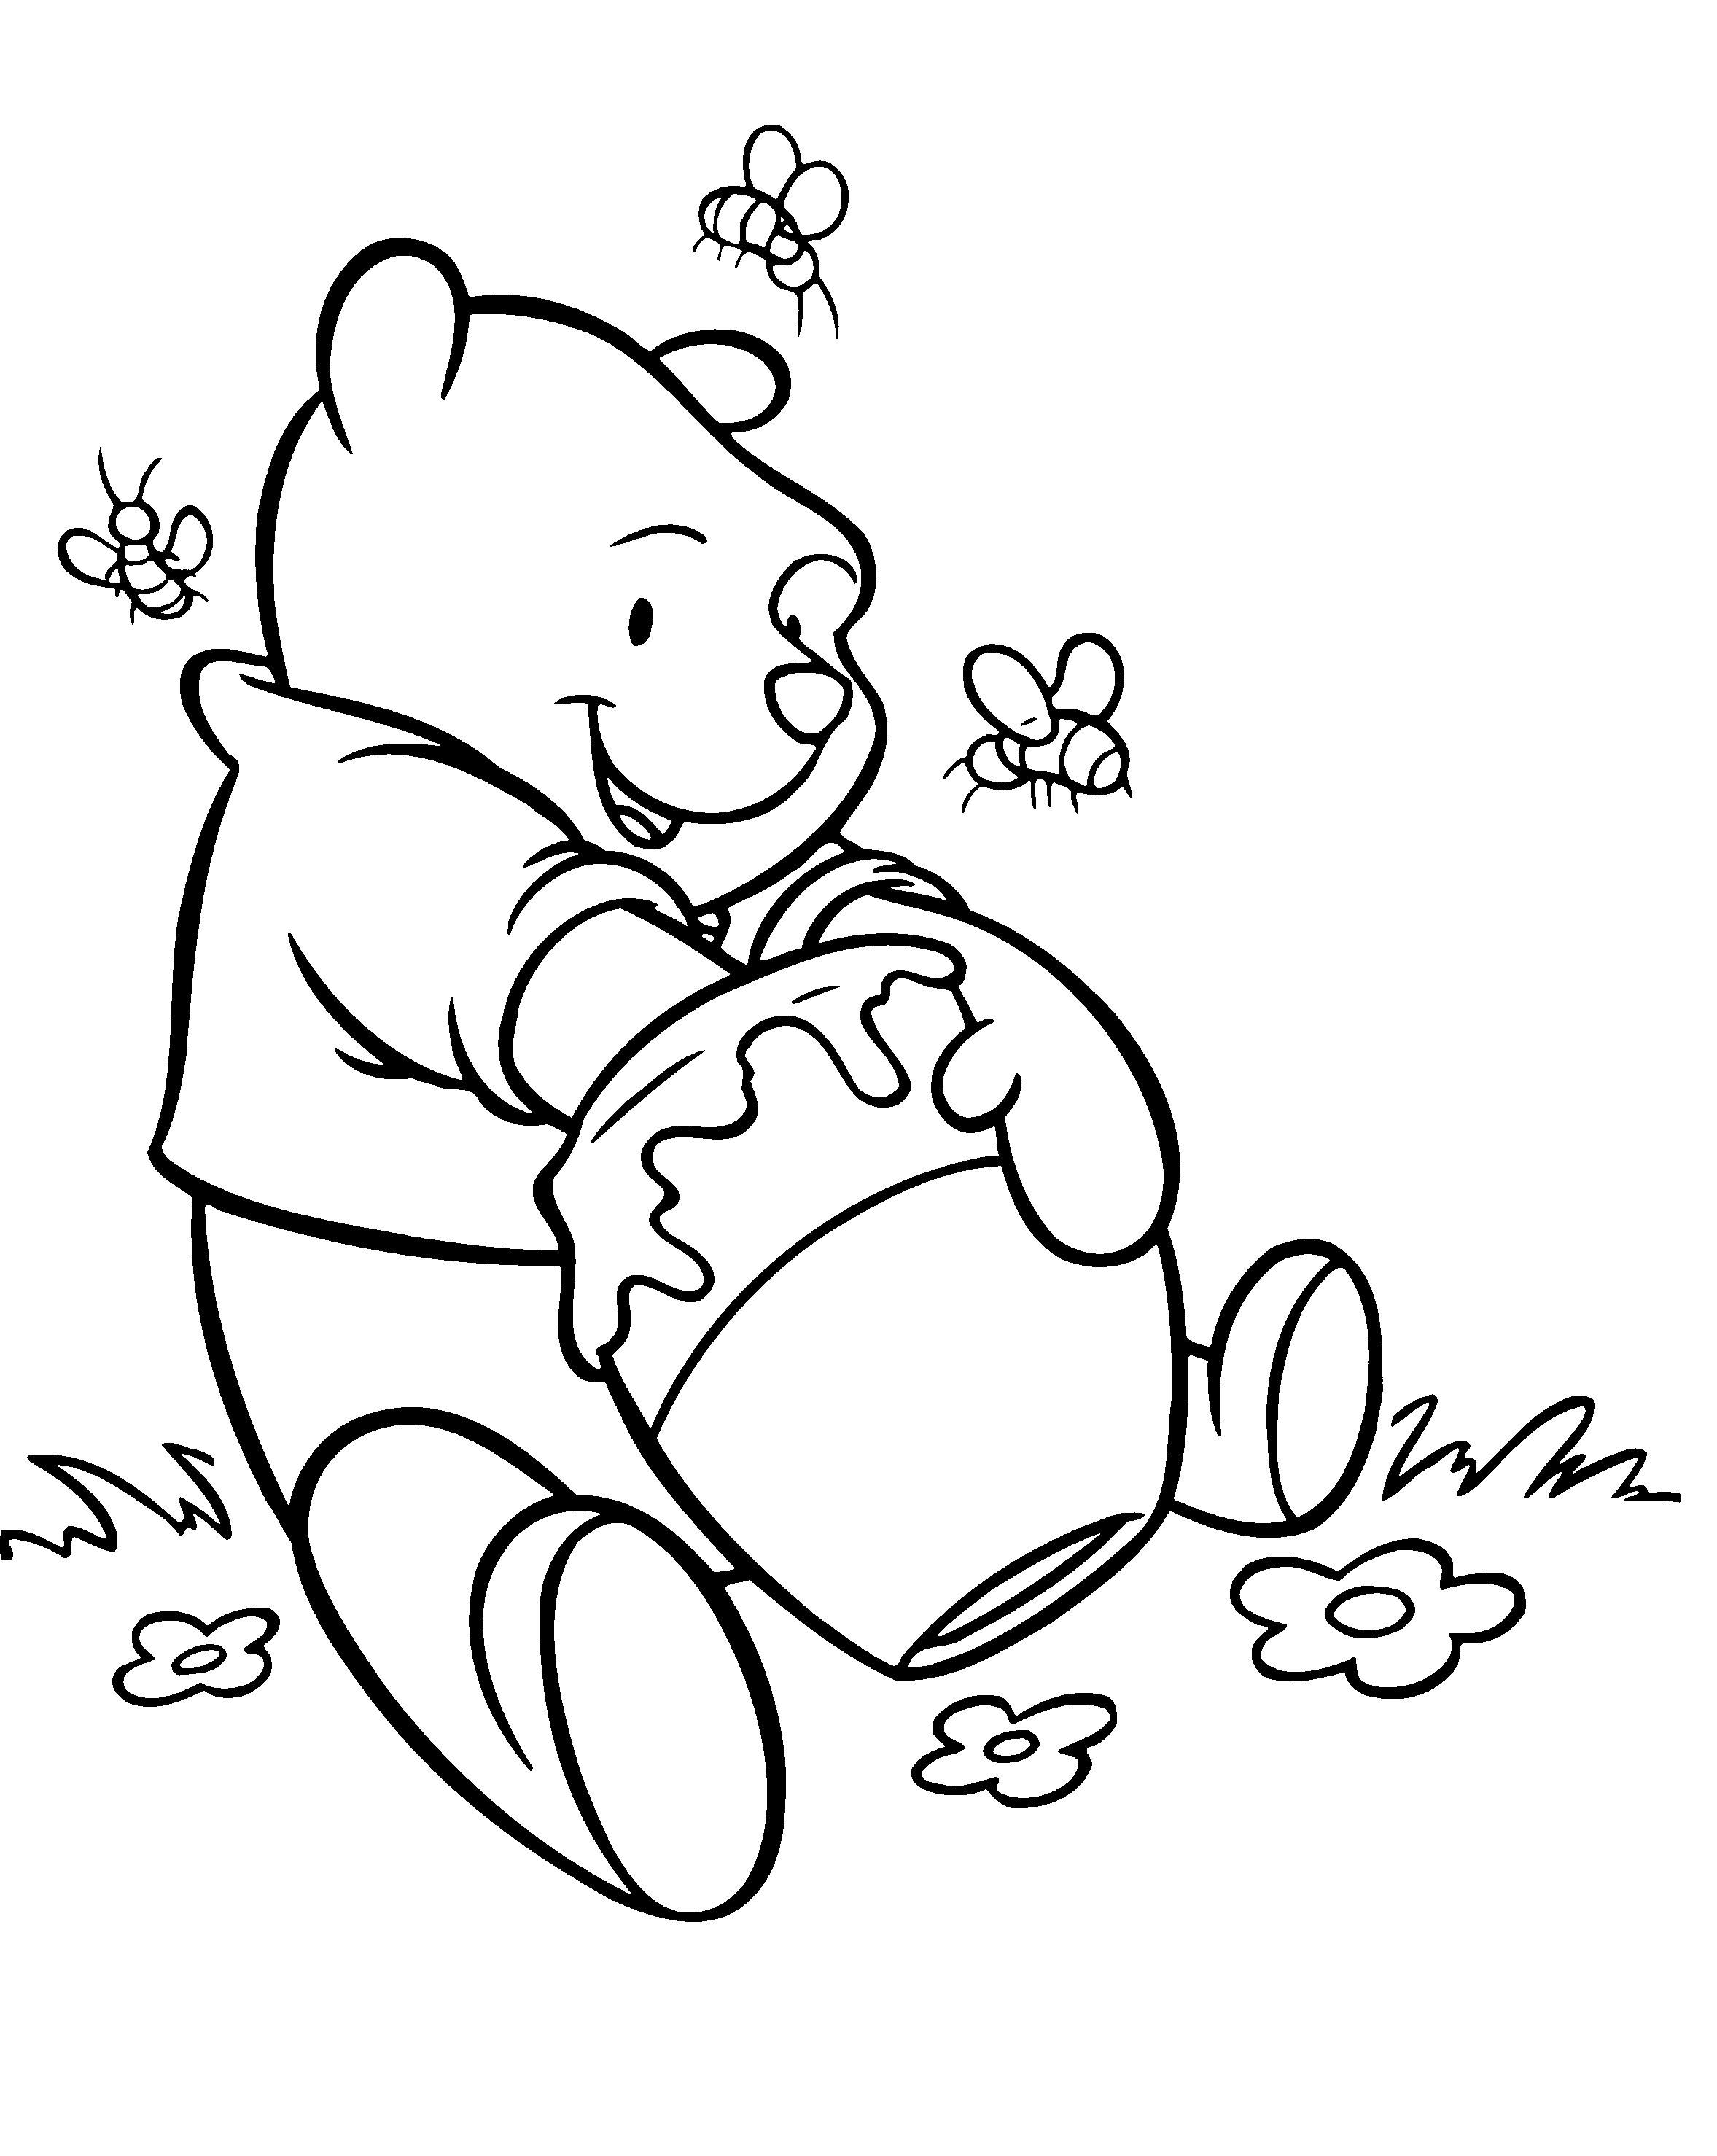 2355x2957 Winnie The Pooh Pencil Sketches Winnie The Pooh Color Pencil